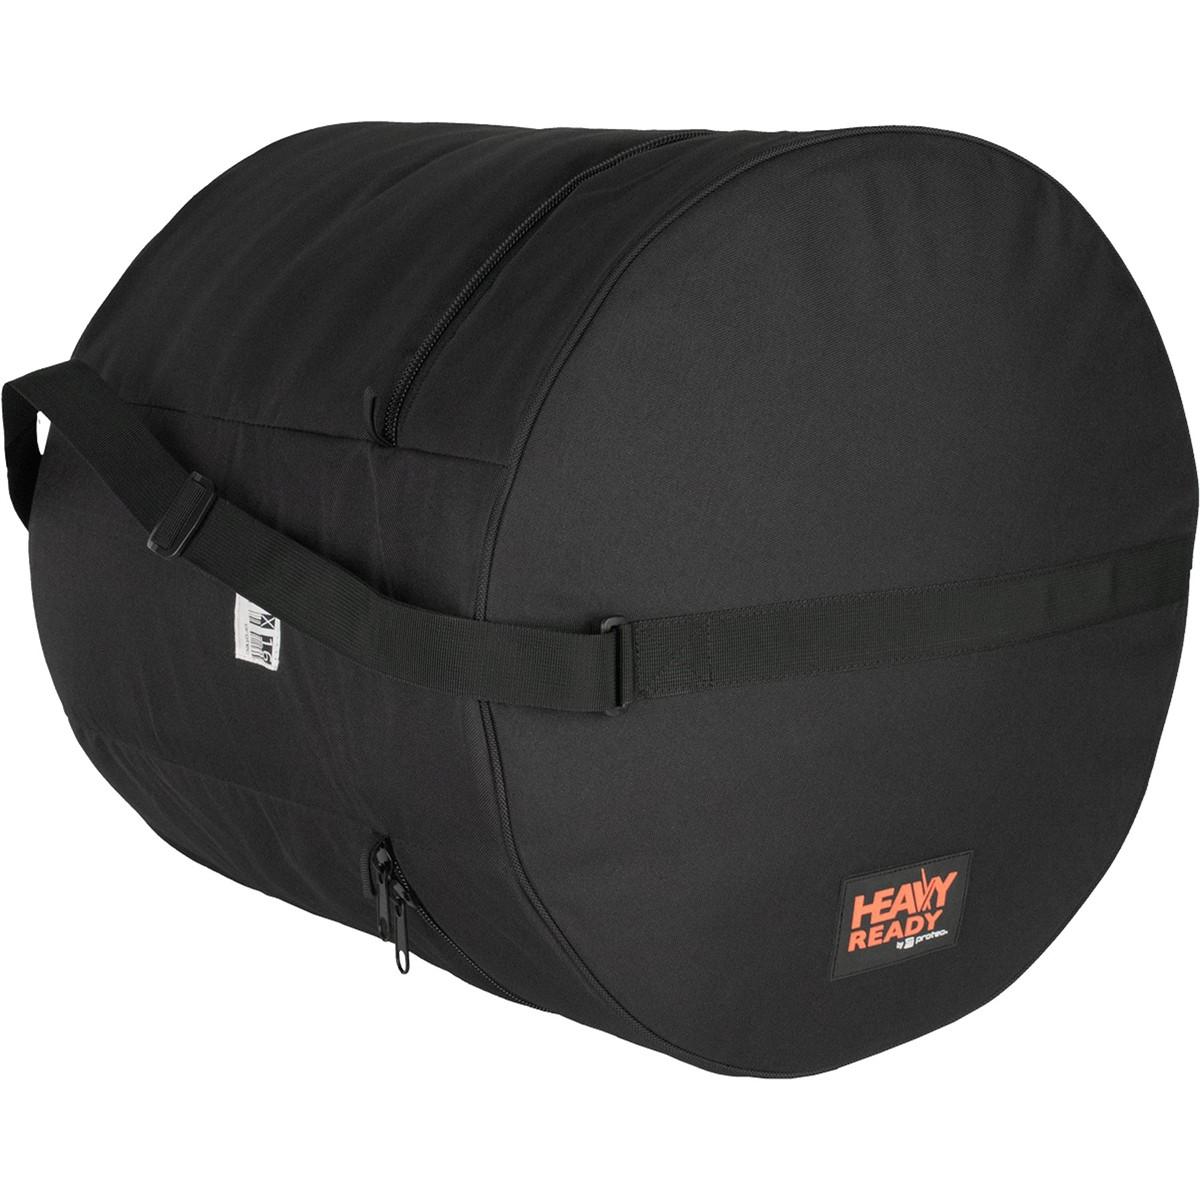 Protec Heavy Ready Series Padded Tom Bag 14″ x 14″ (HR1414)